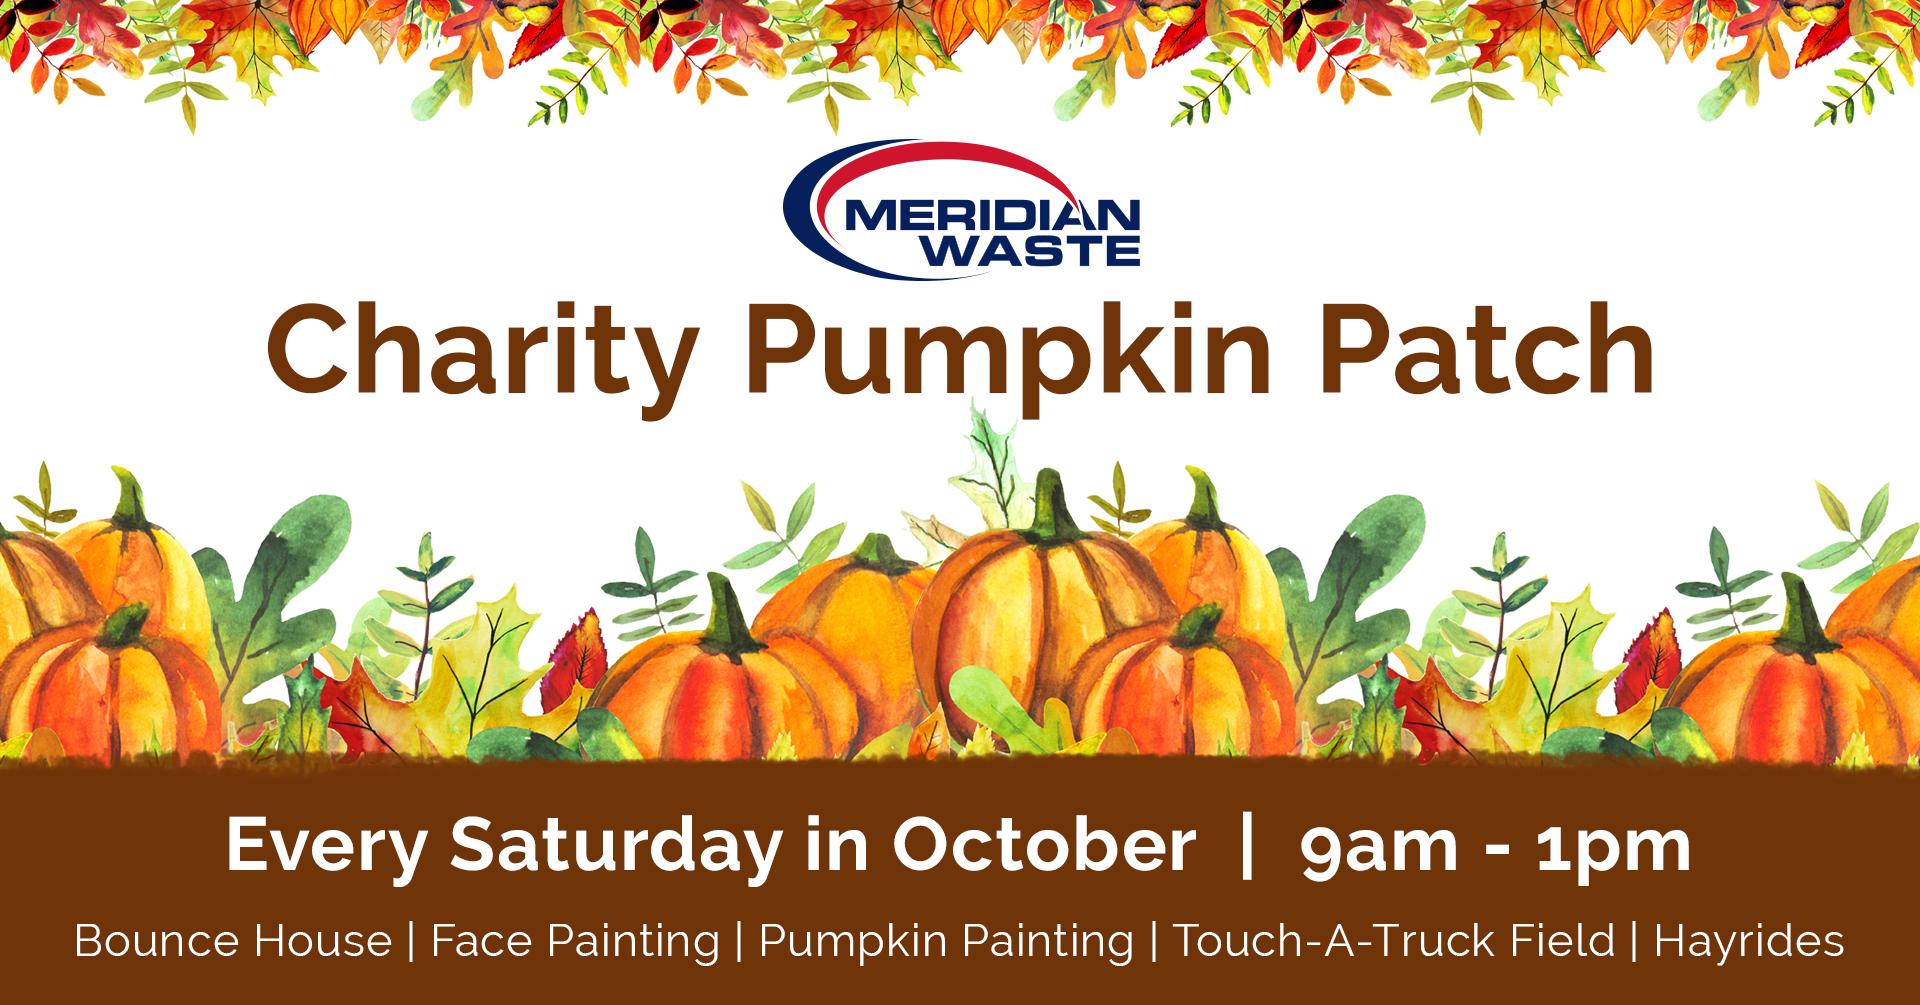 Meridian Waste Charity Pumpkin Patch